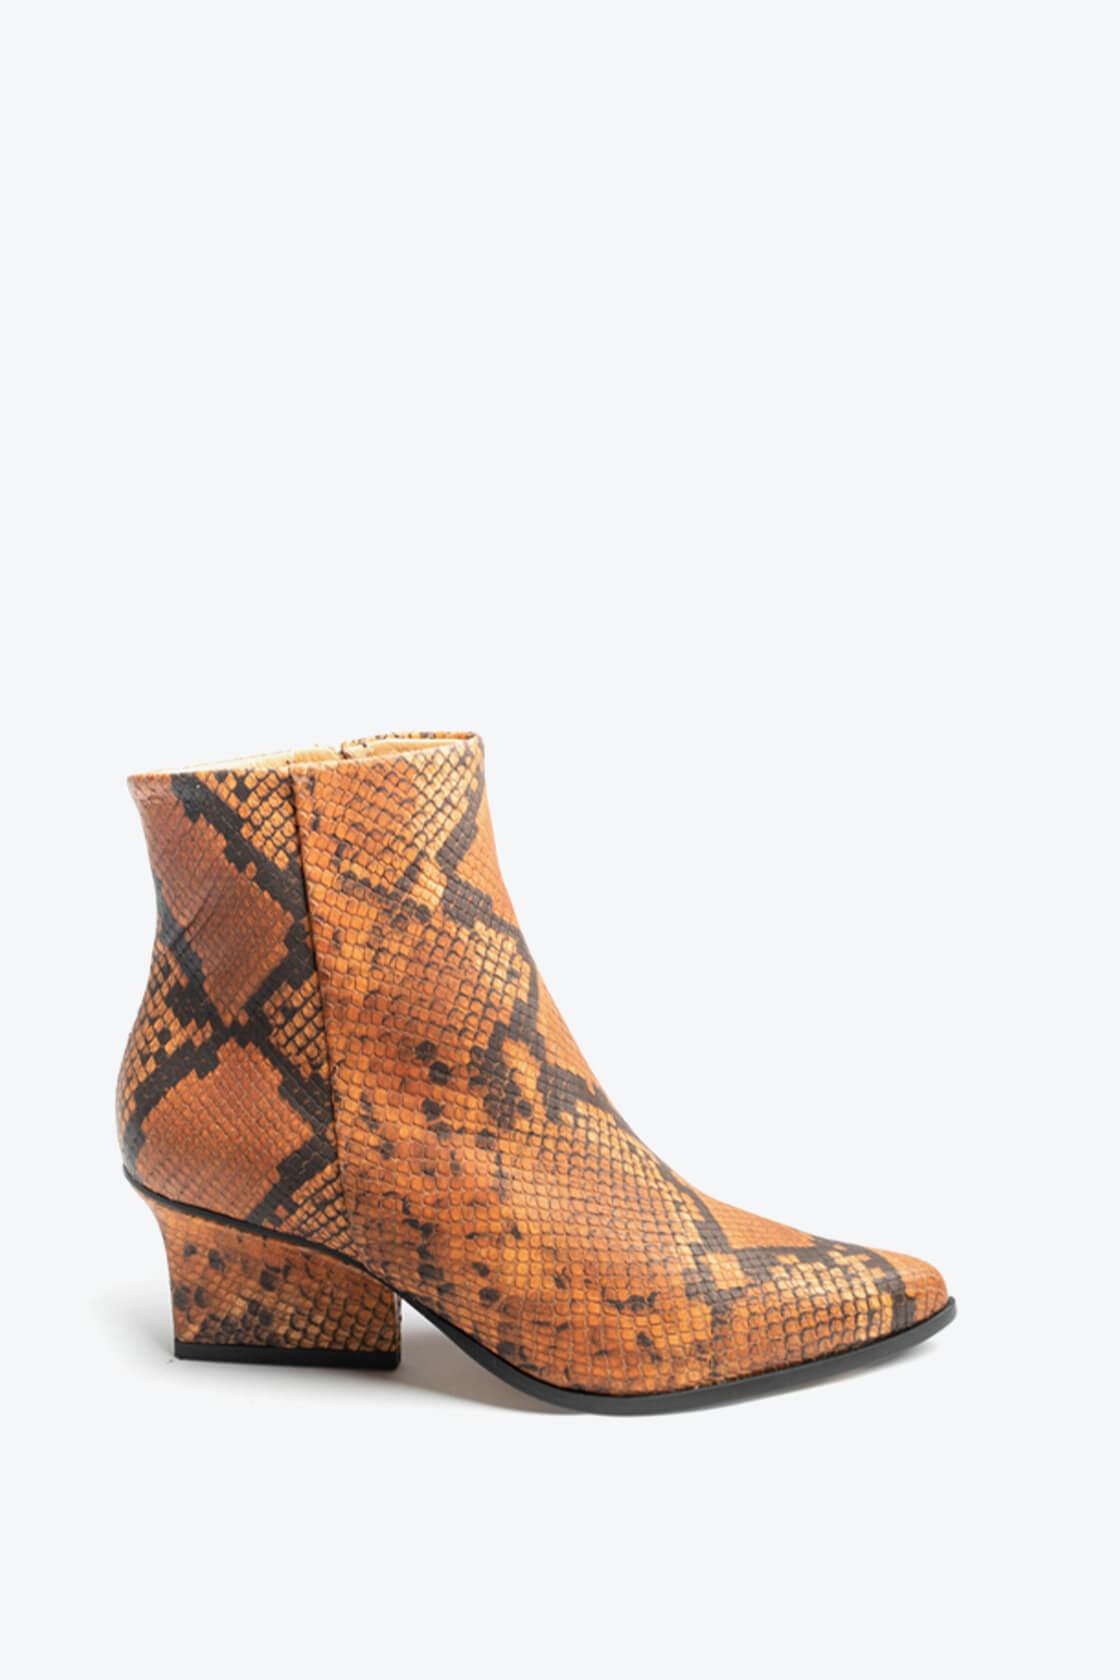 EJK0000081 Ryan ankle boots Camel python 1